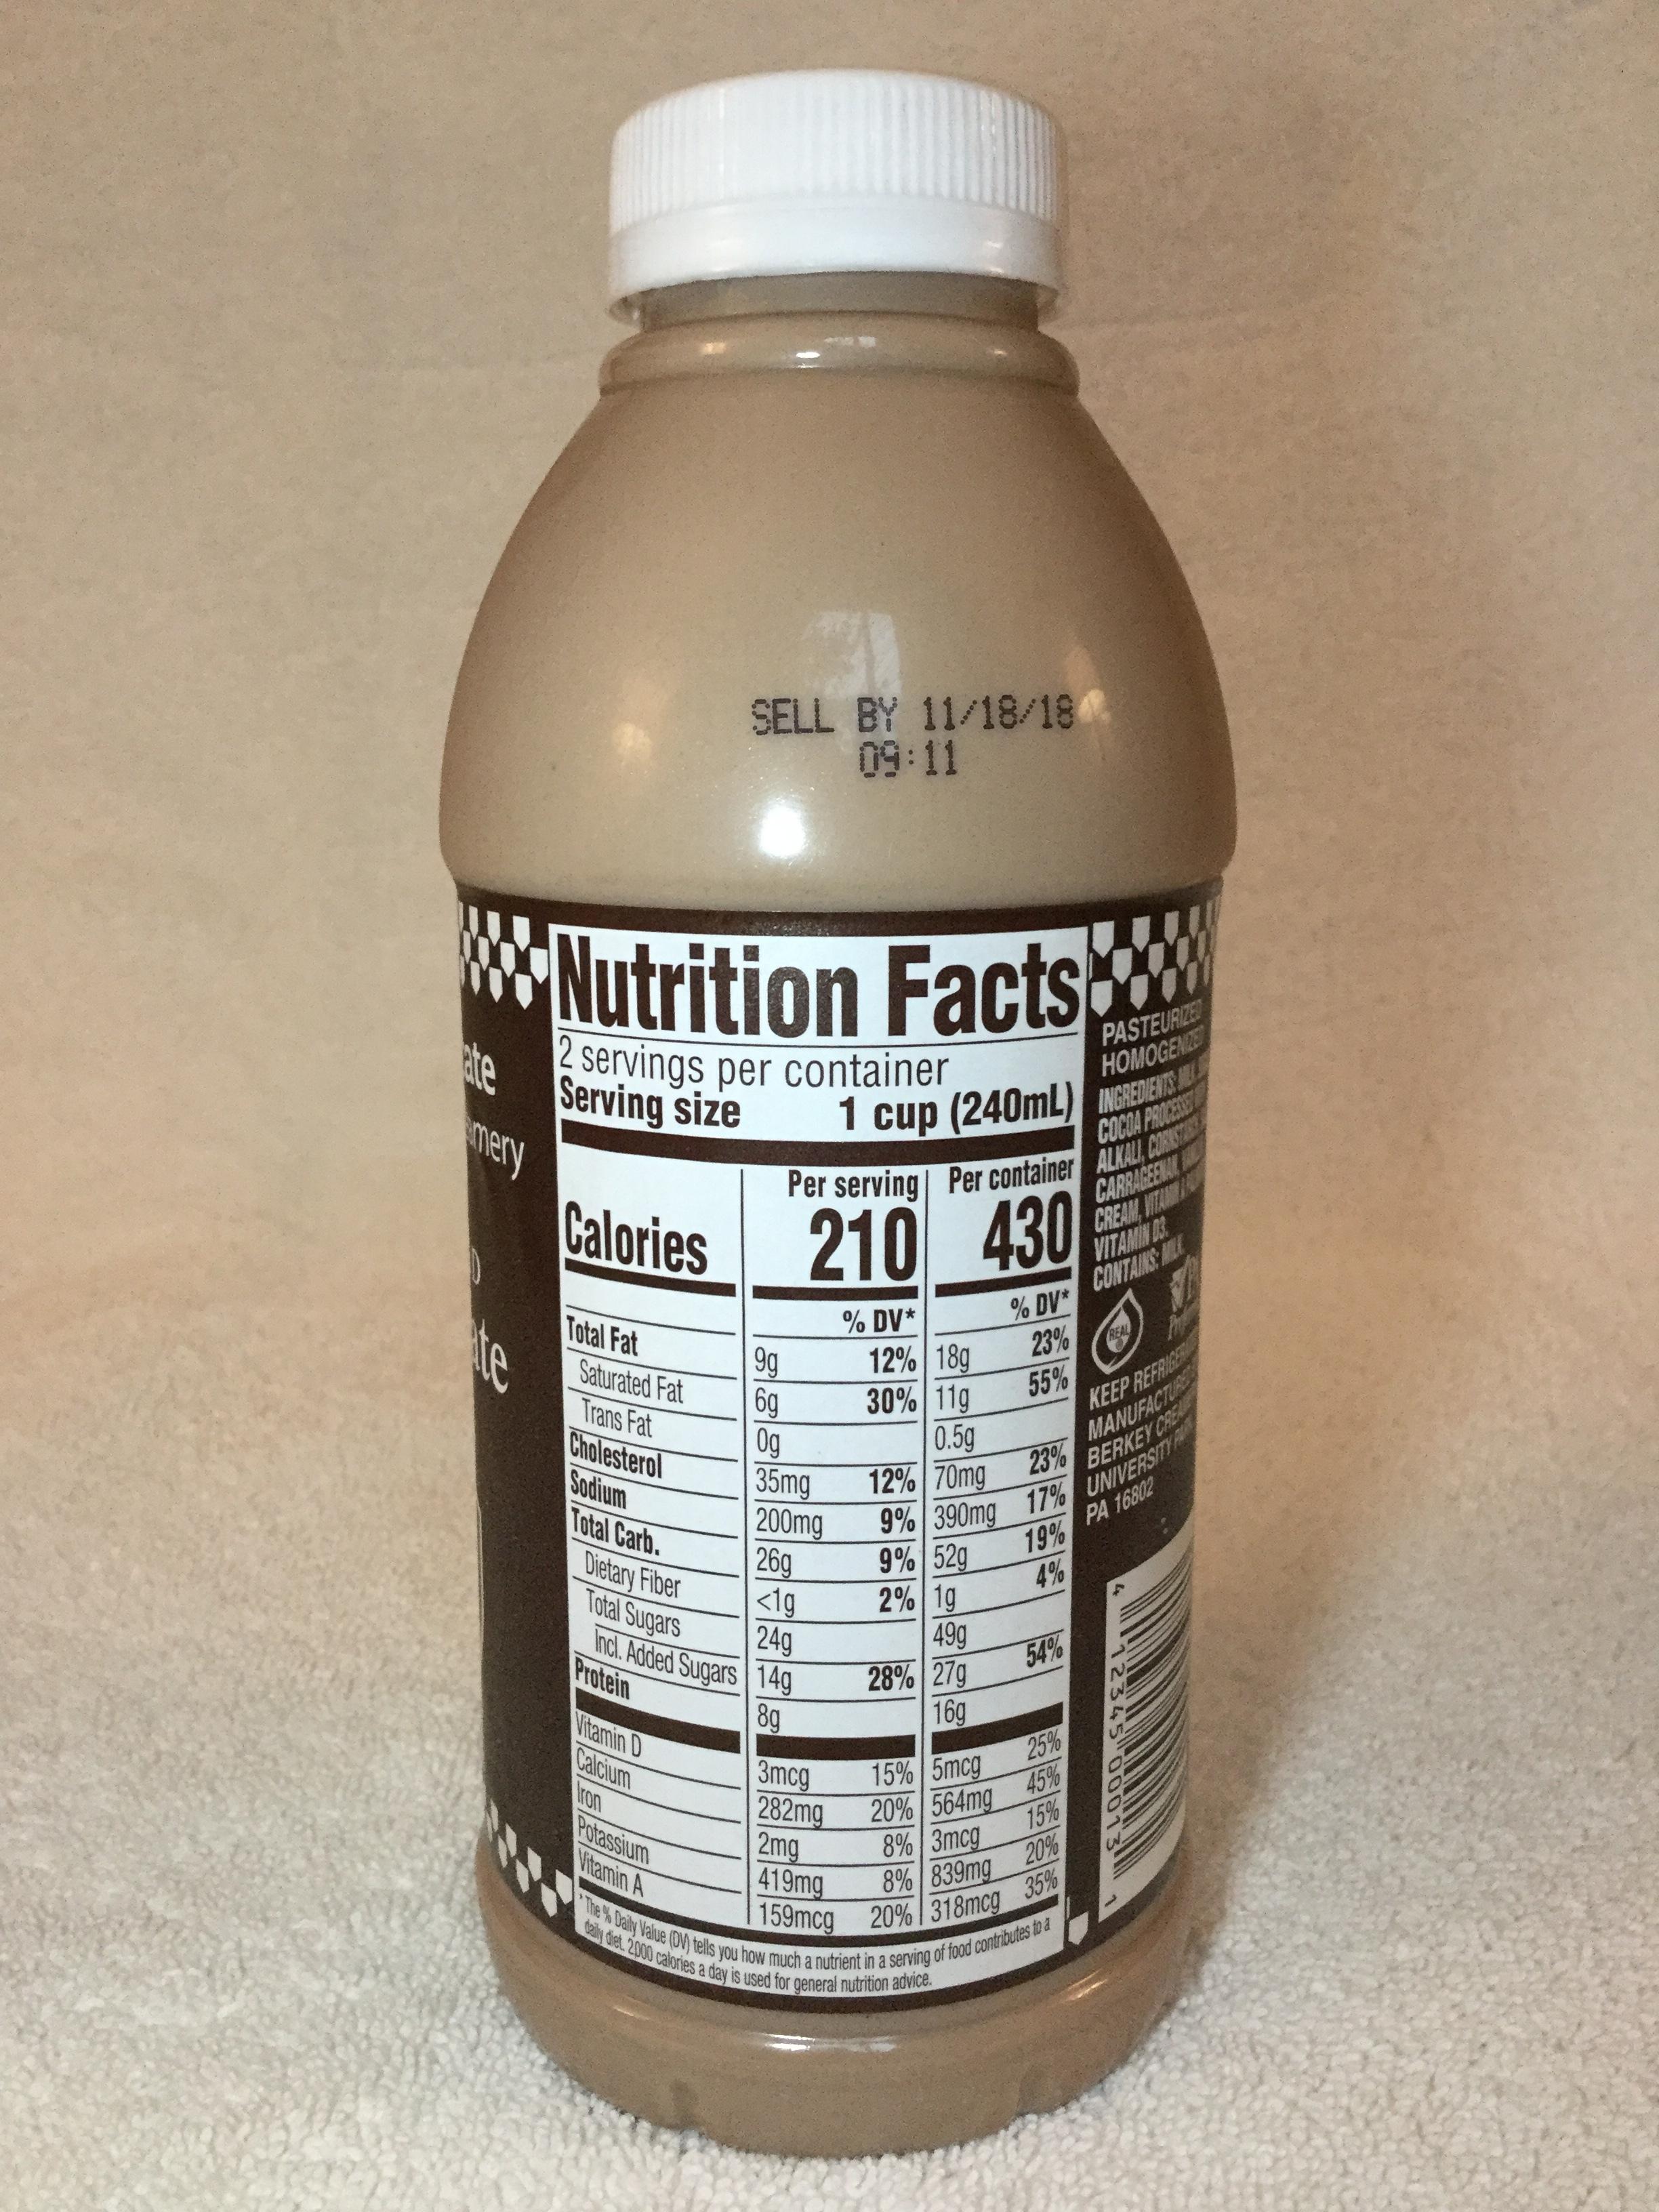 Penn State Berkey Creamery Chocolate Milk Side 1